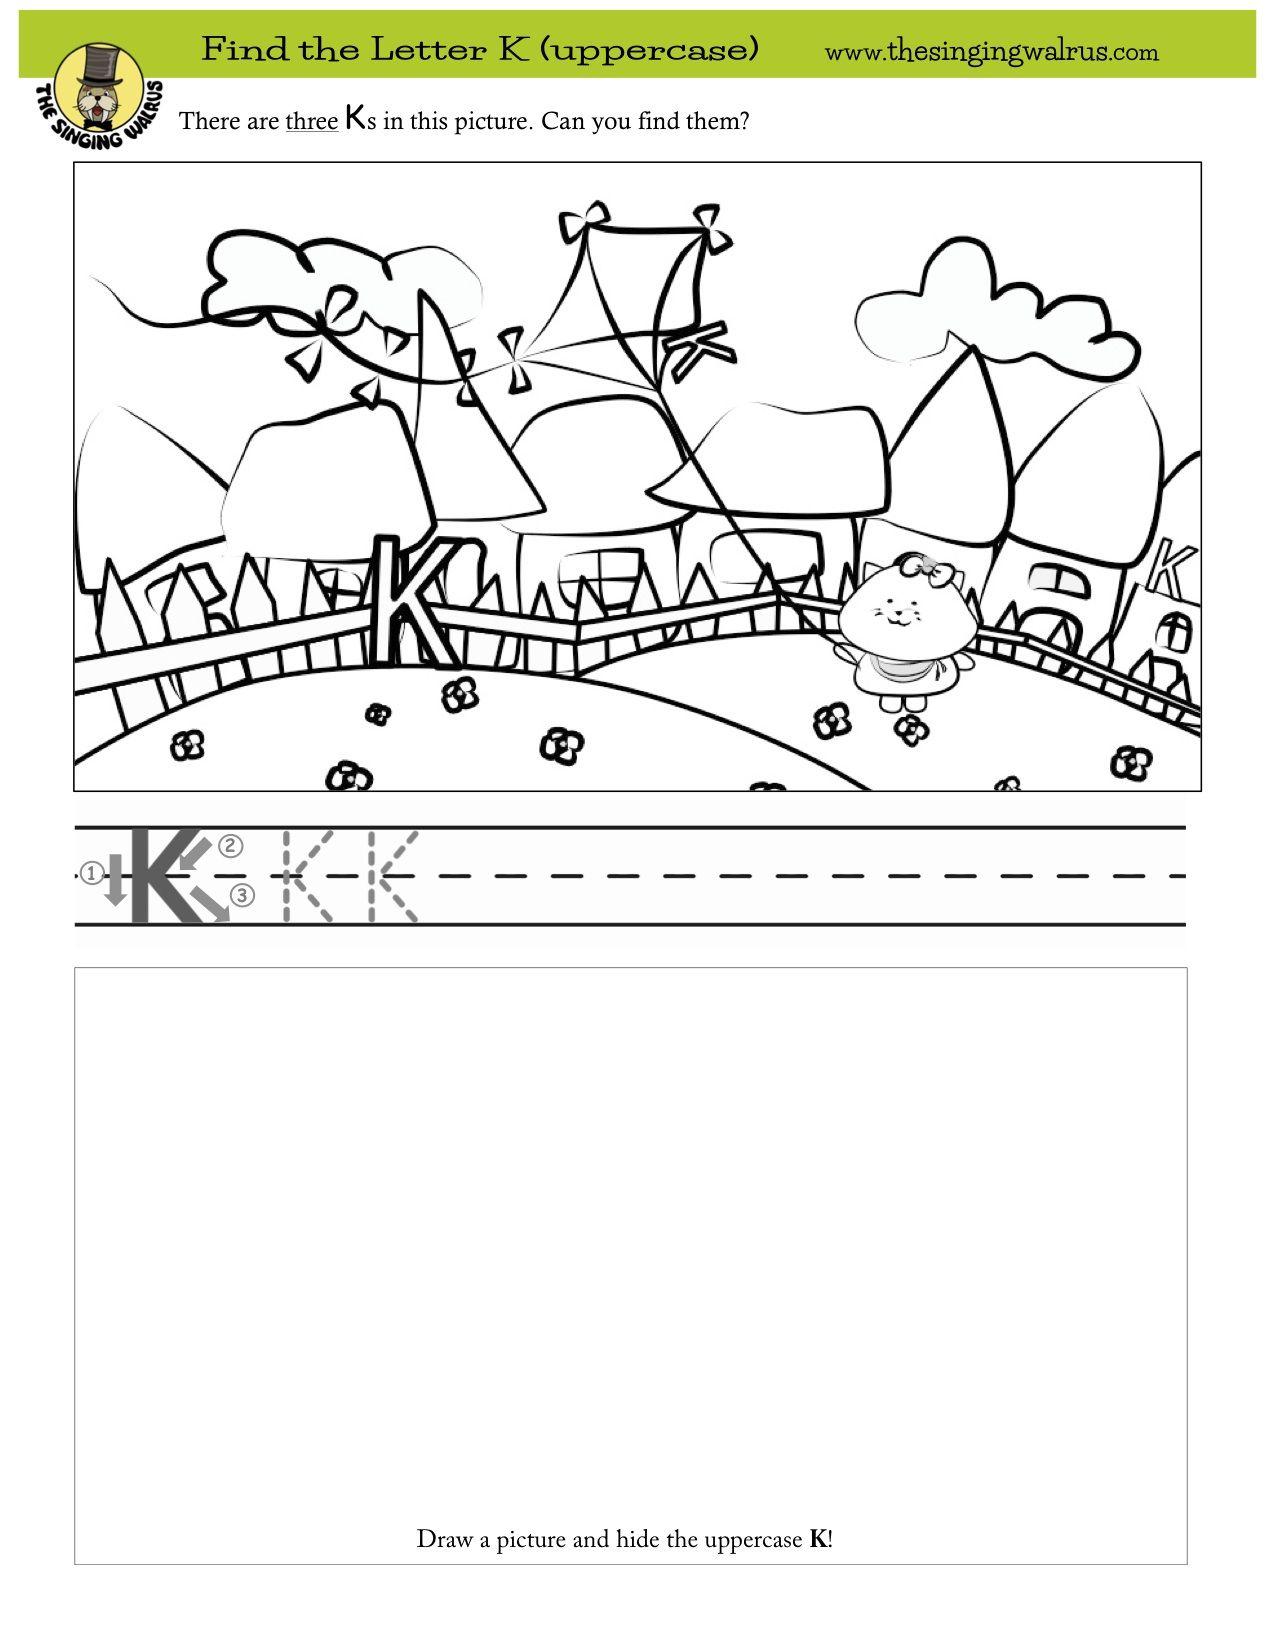 Worksheets Worksheet On Letter Land Song find the three hidden letter ks more free printables and fun worksheets singing walrus